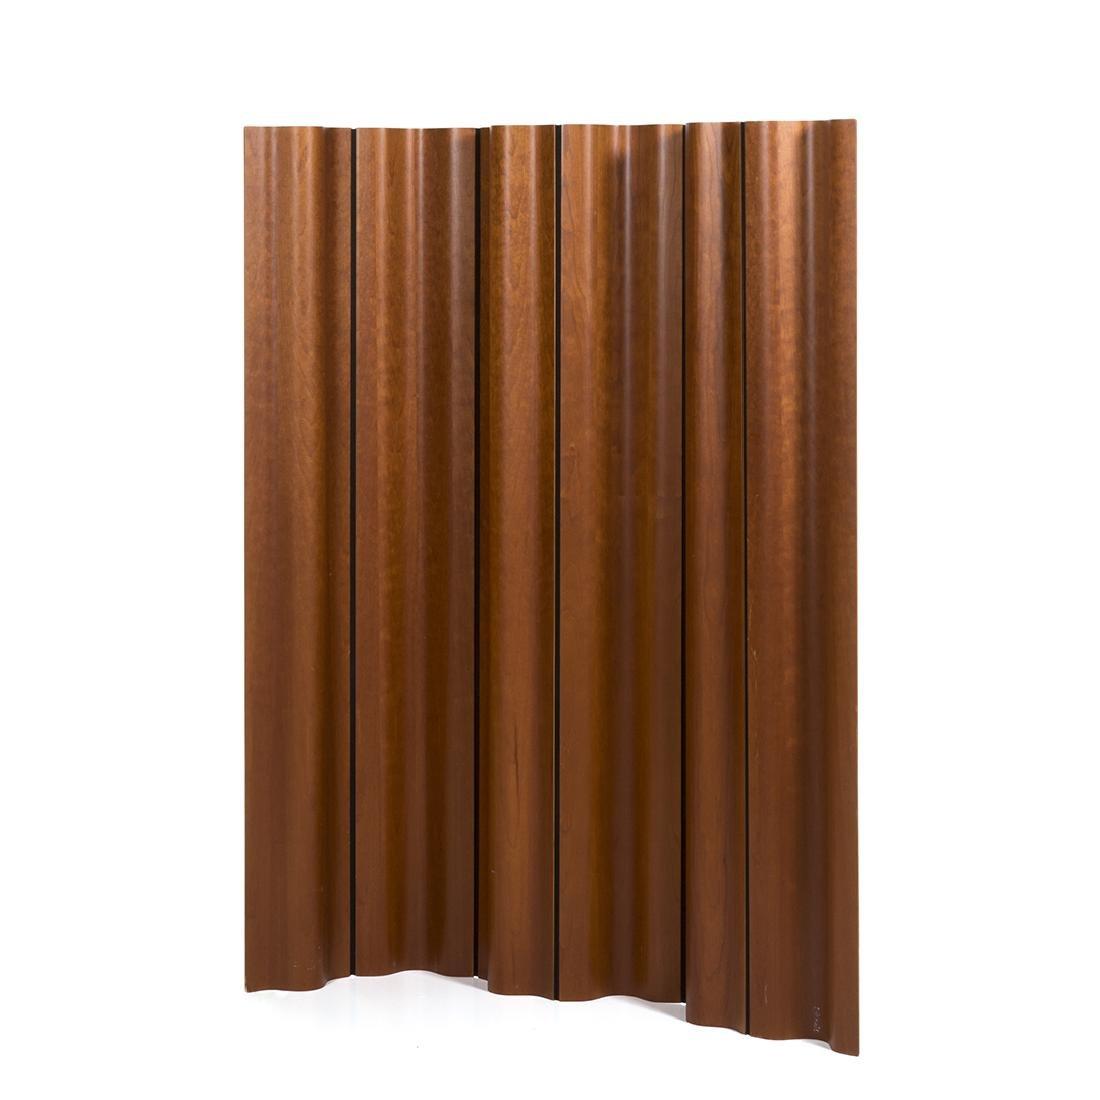 Charles Eames Six Panel Screen